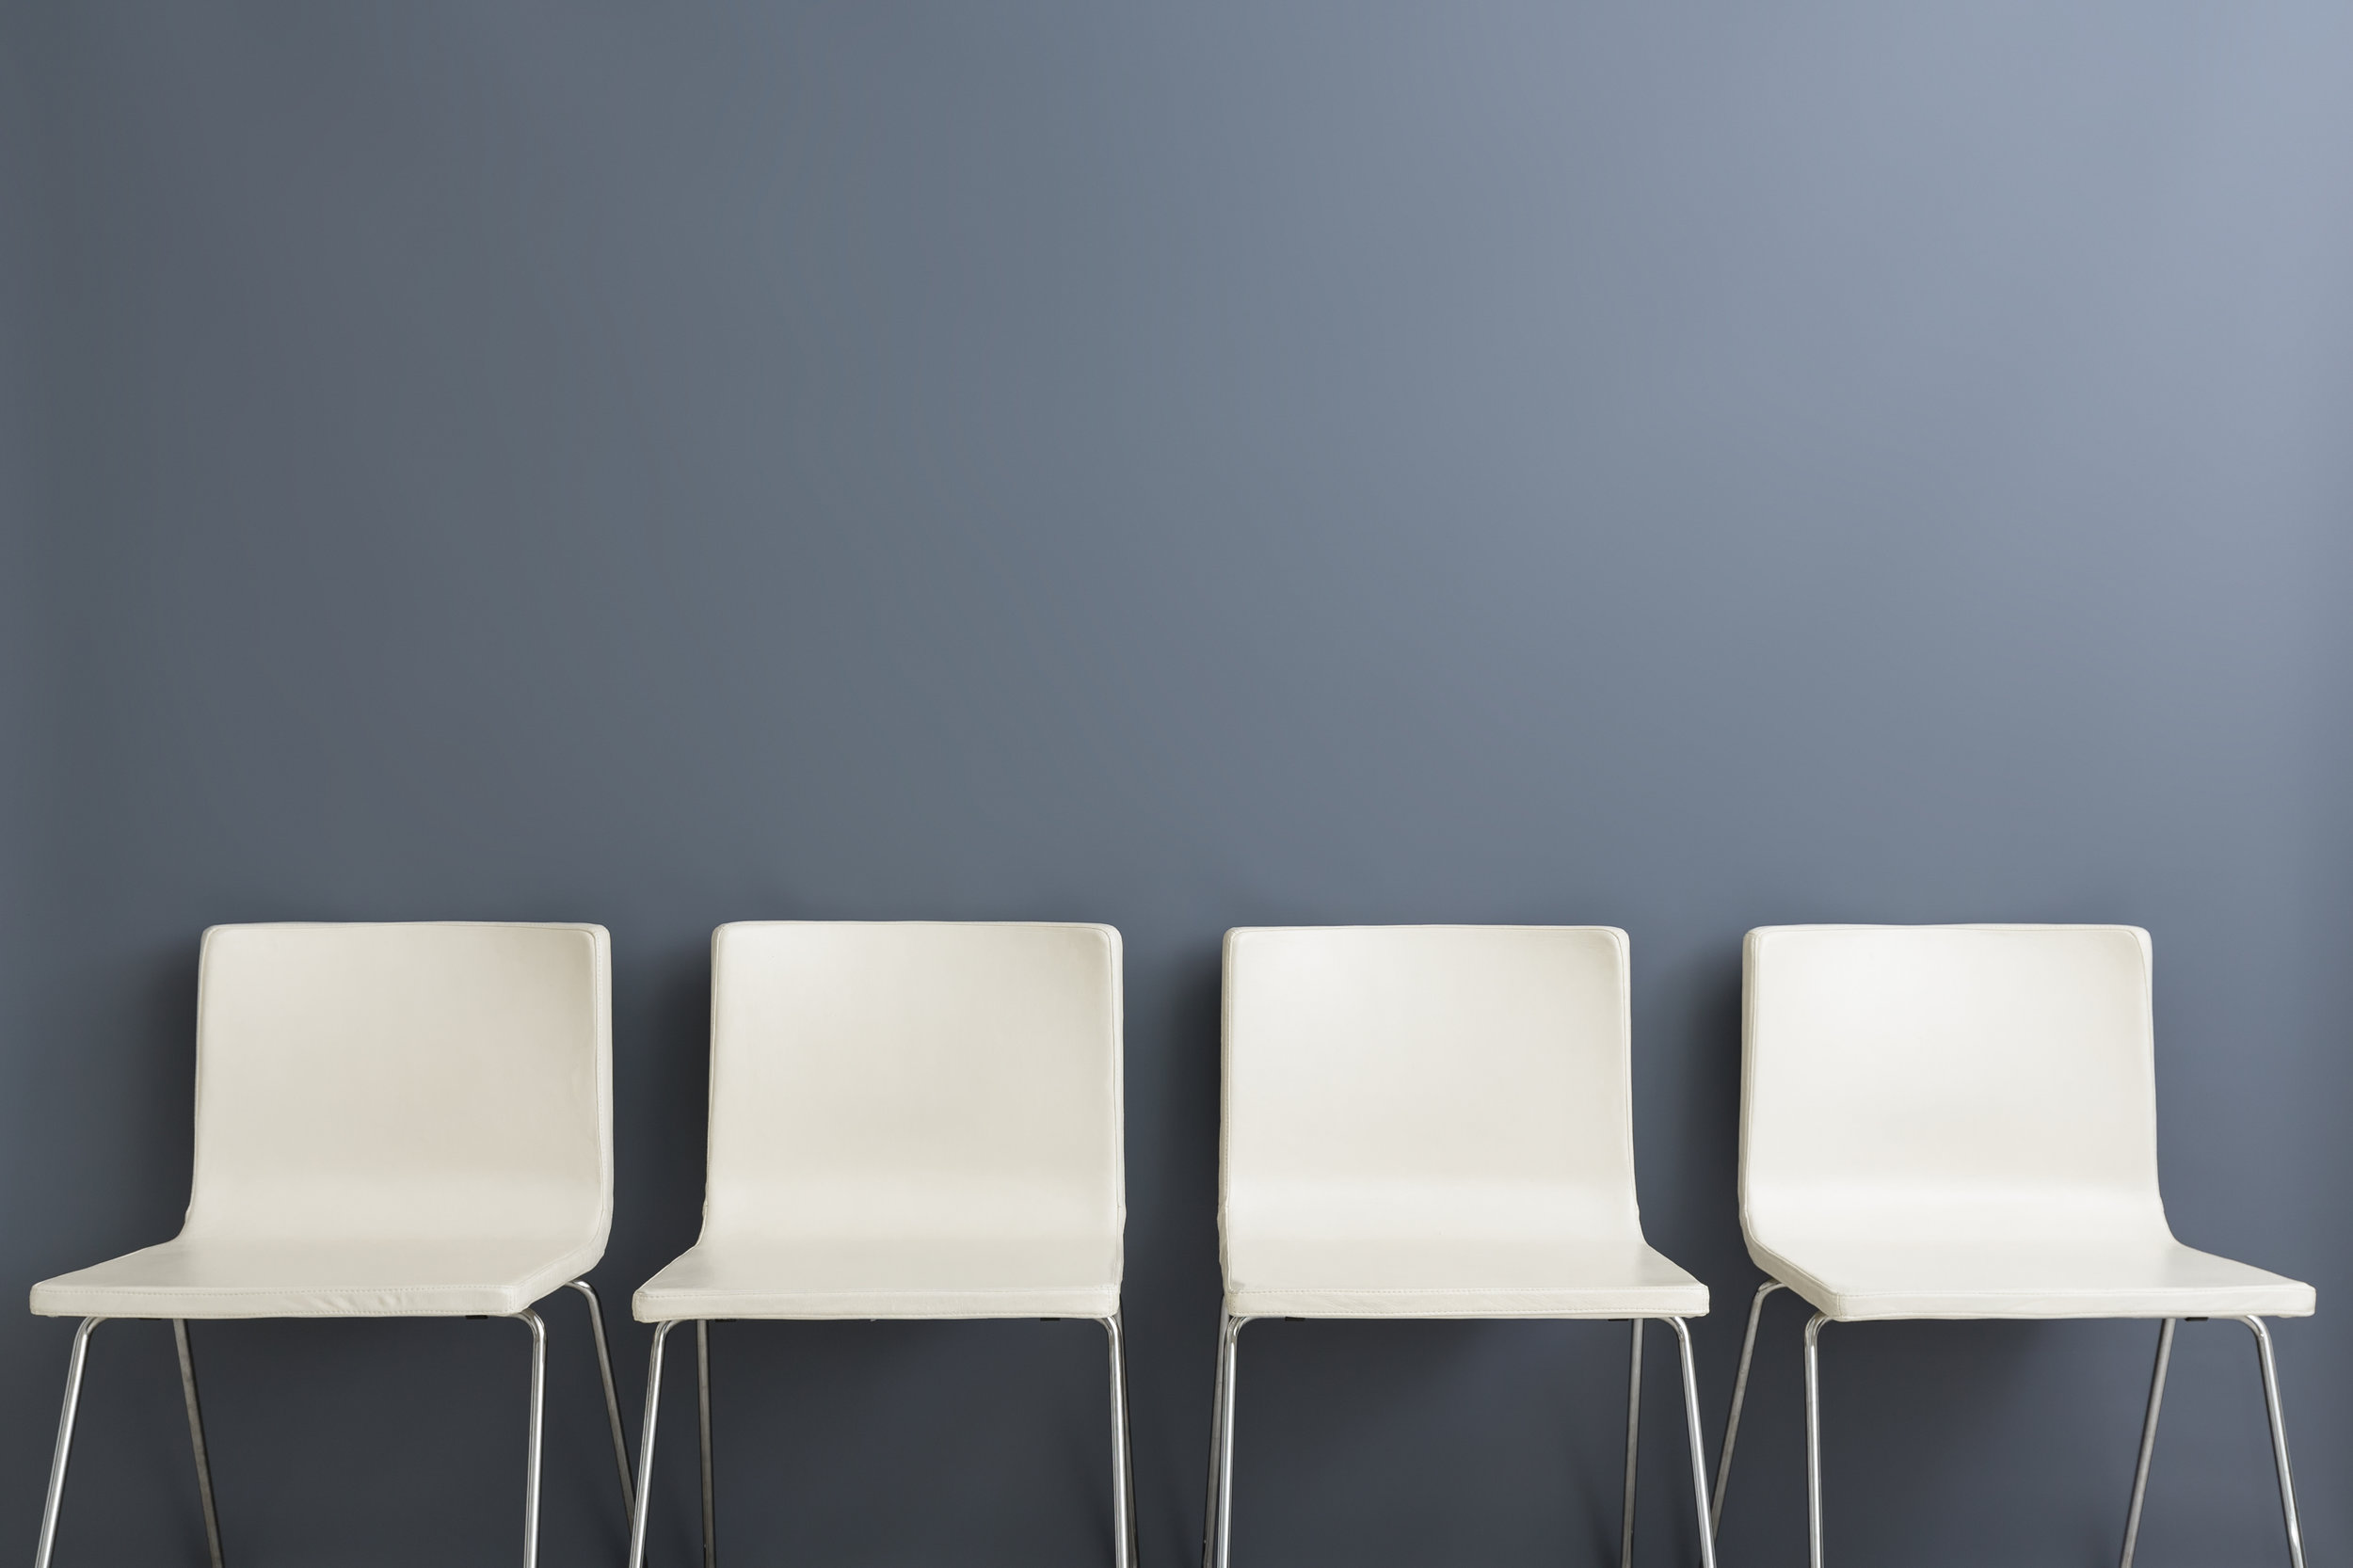 Chair-background-concept---recruitment-hire-hiring-interview-628279378_4697x3131.jpeg